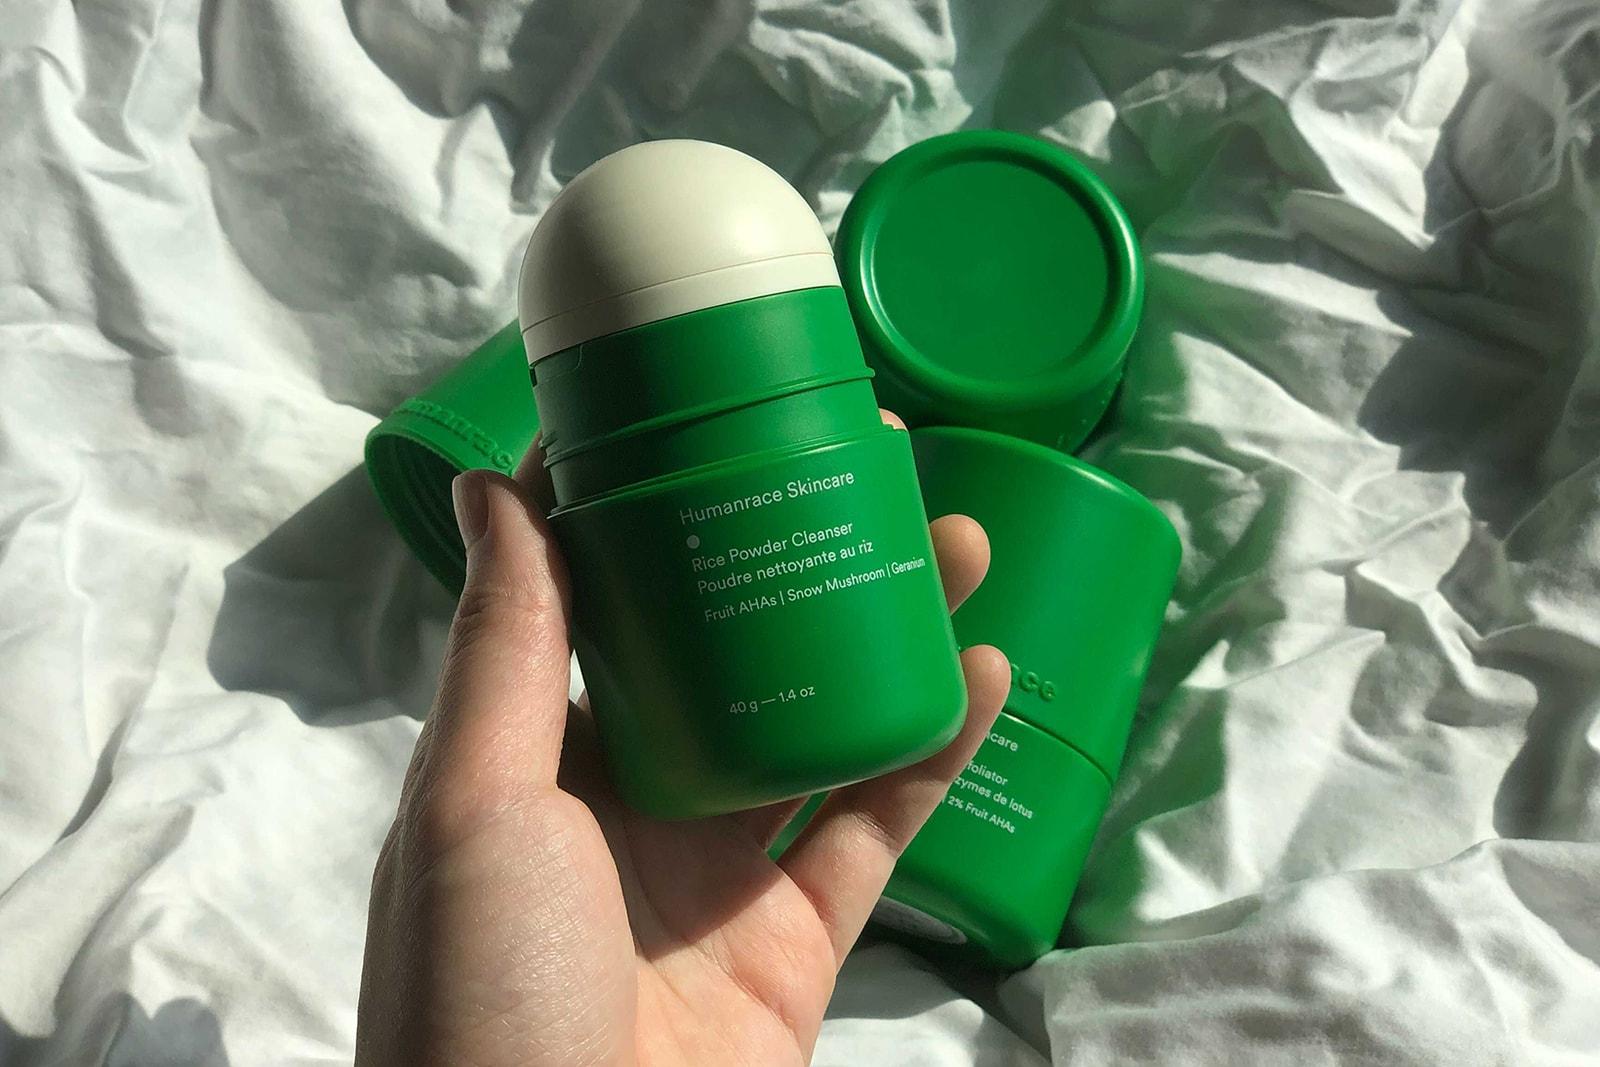 pharrell humanrace skincare review vegan sustainable refillable powder cleanser exfoliator moisturizer cream